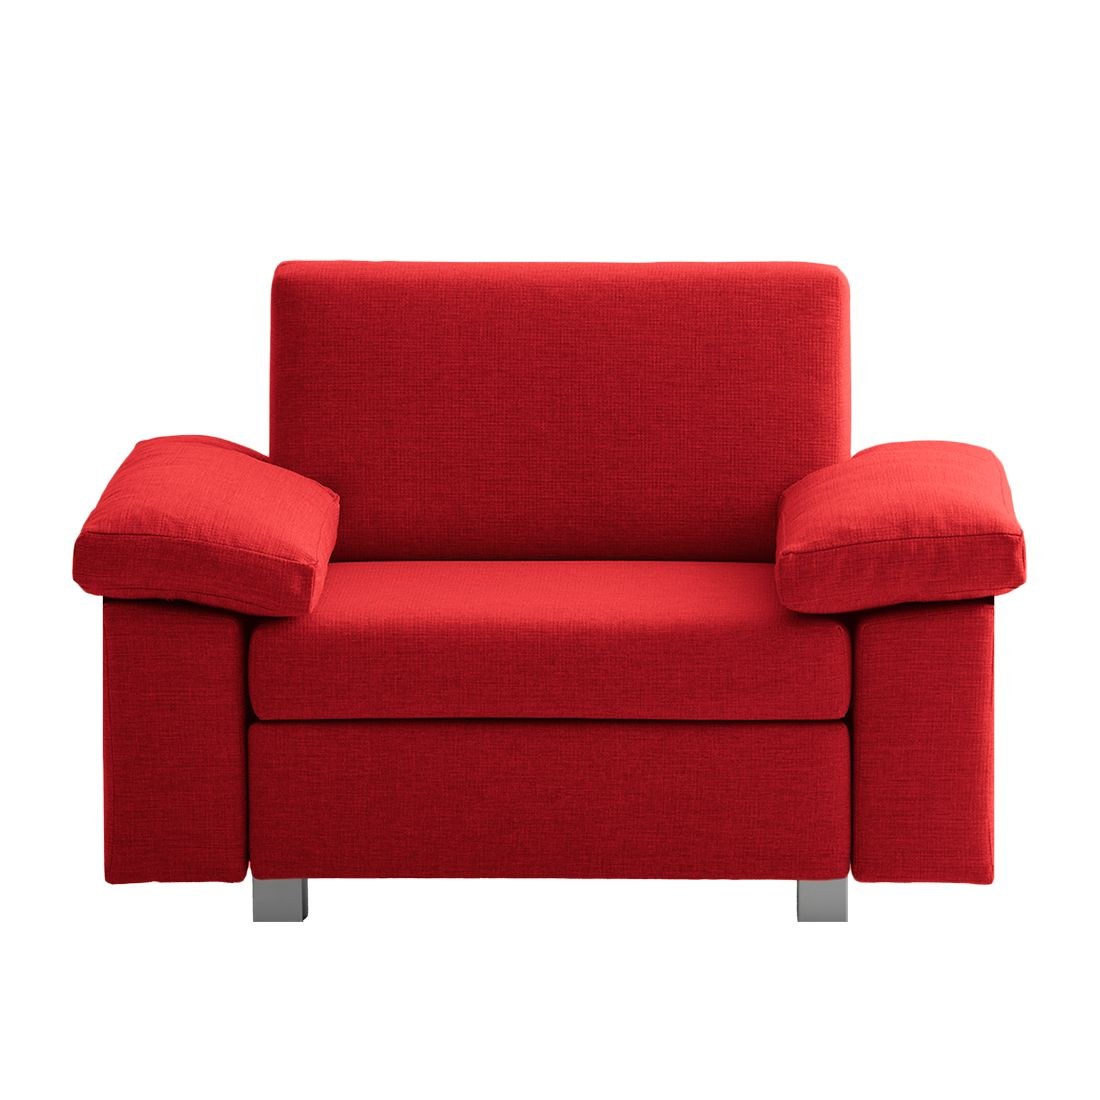 goedkoop Slaapfauteuil Plaza geweven stof Rood Opklapbare armleuningen chillout by Franz Fertig